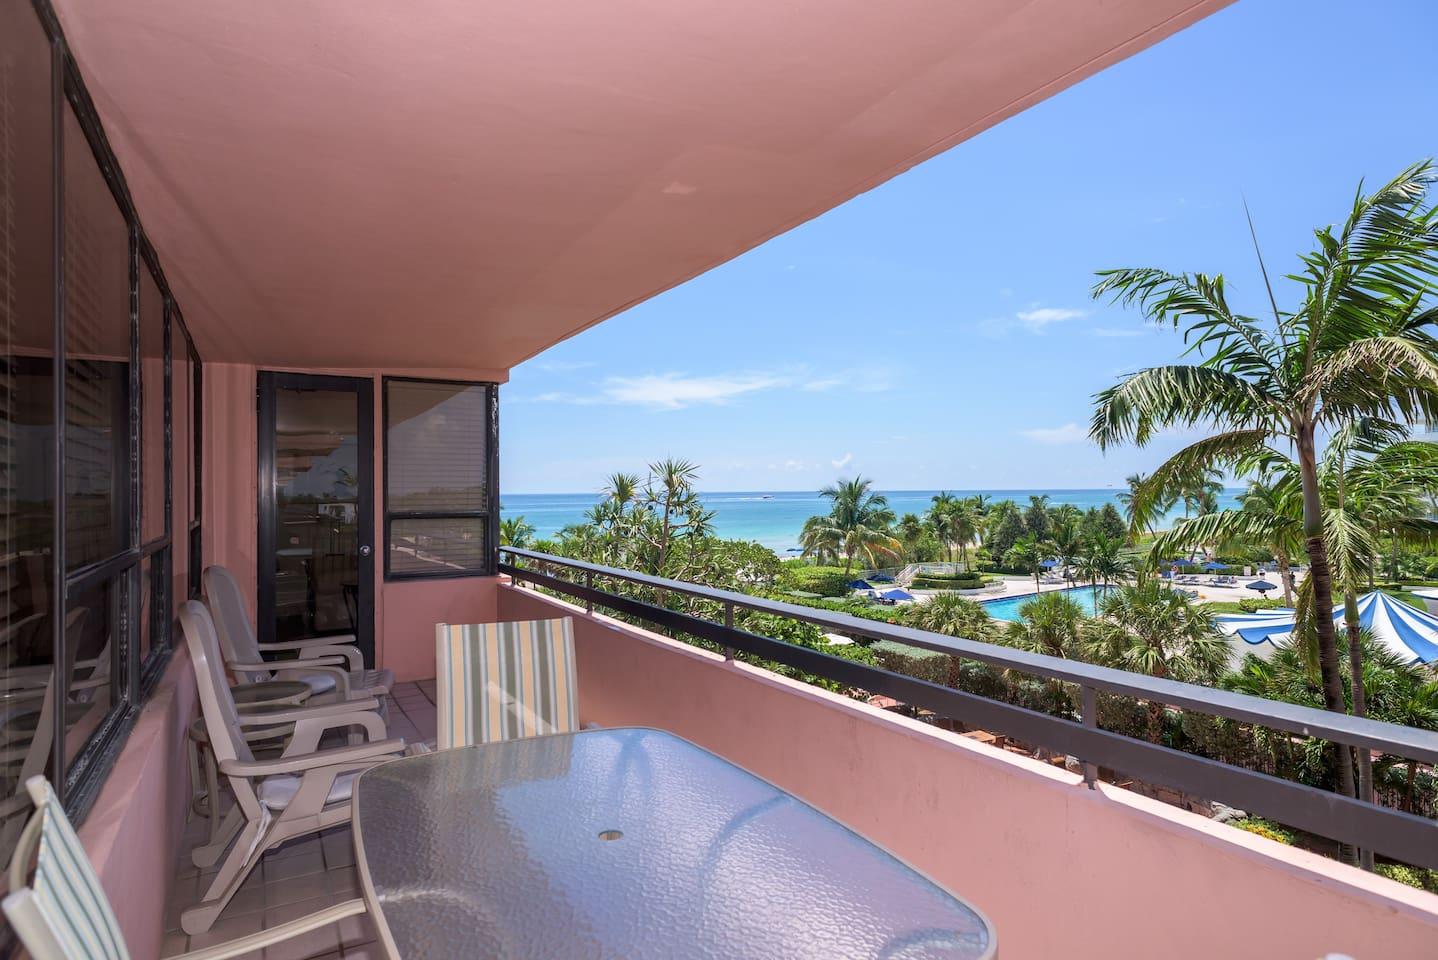 603 LOW PRICED Beachfront w/View